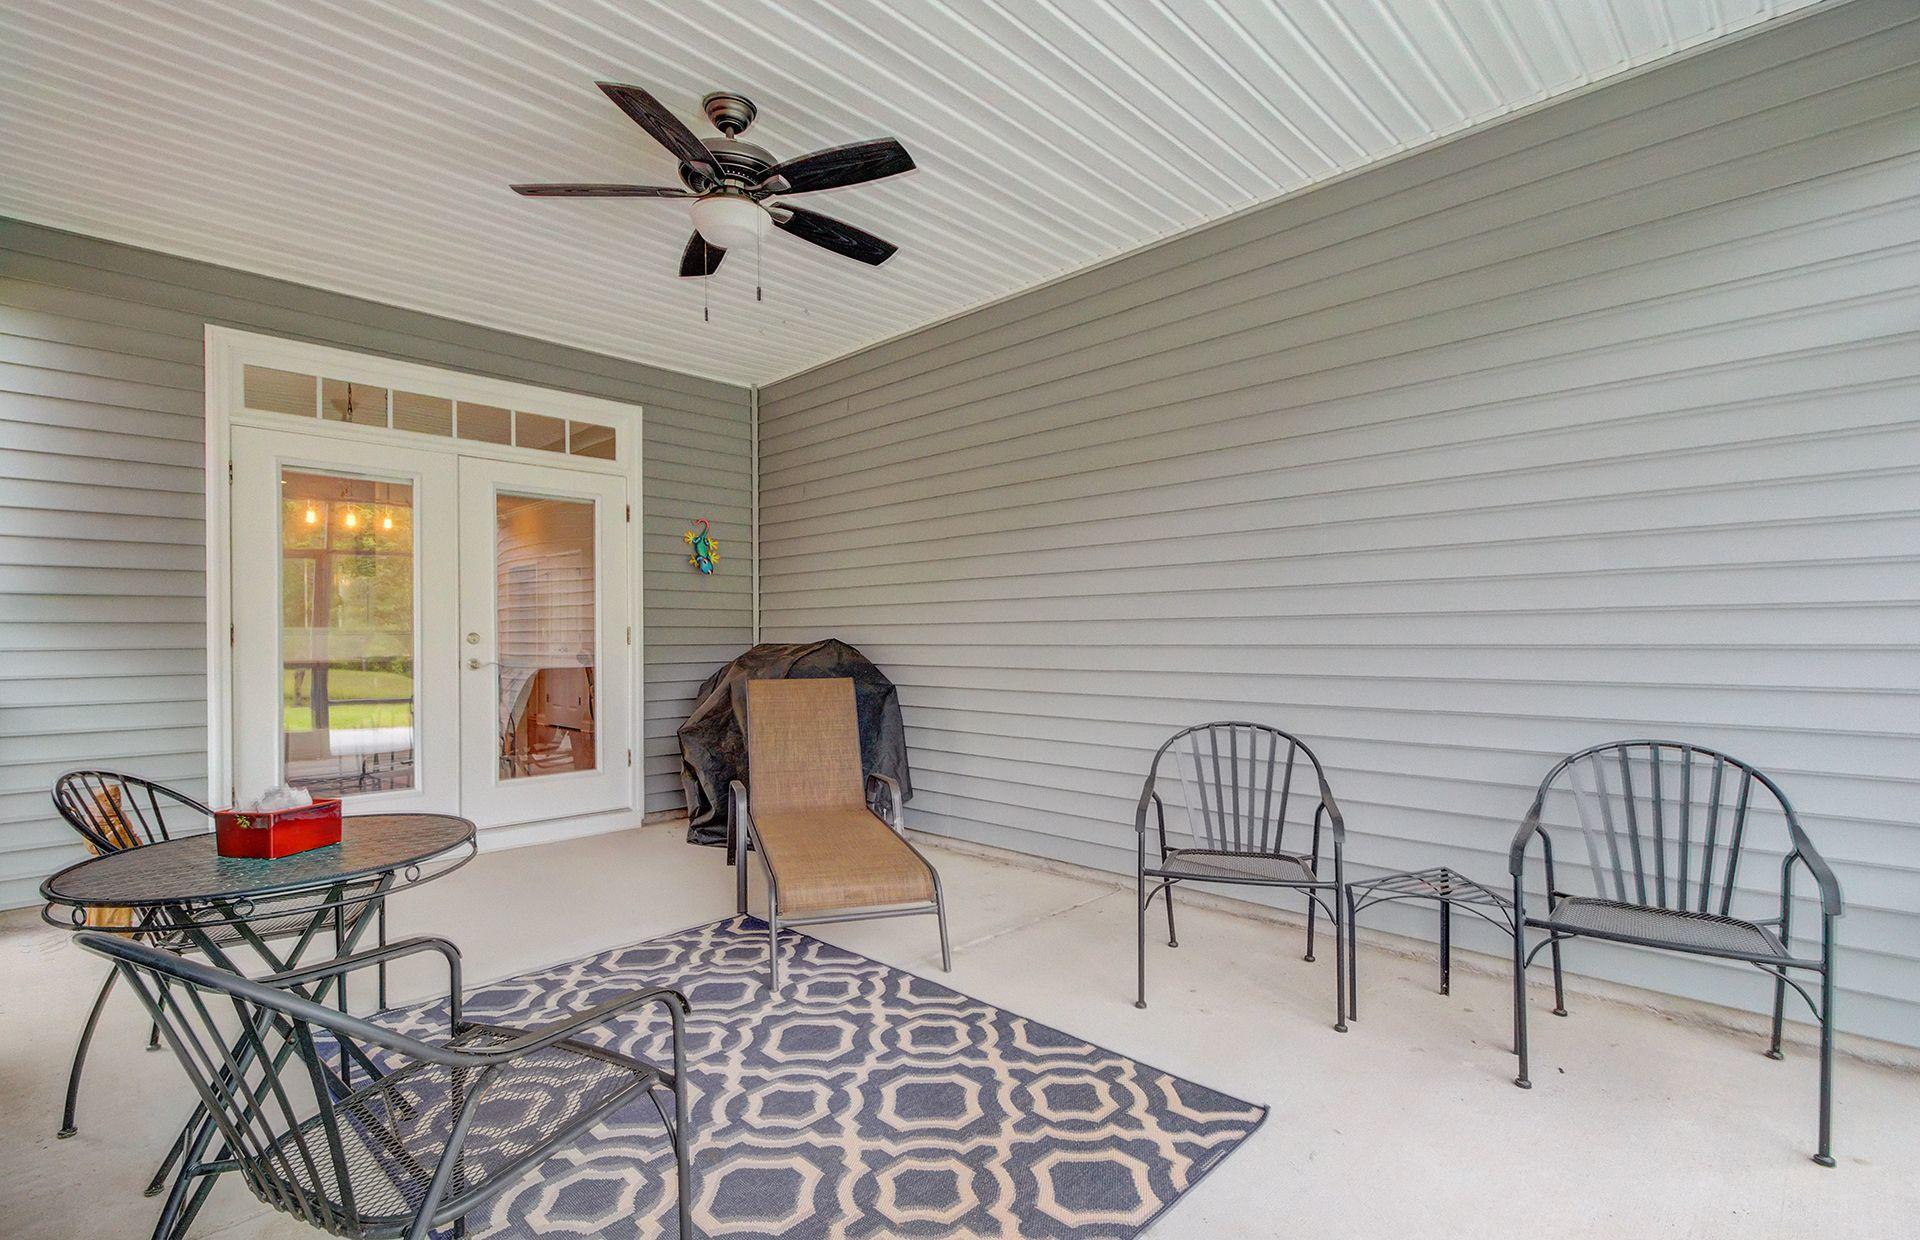 Linnen Place Homes For Sale - 1275 Shingleback, Mount Pleasant, SC - 8